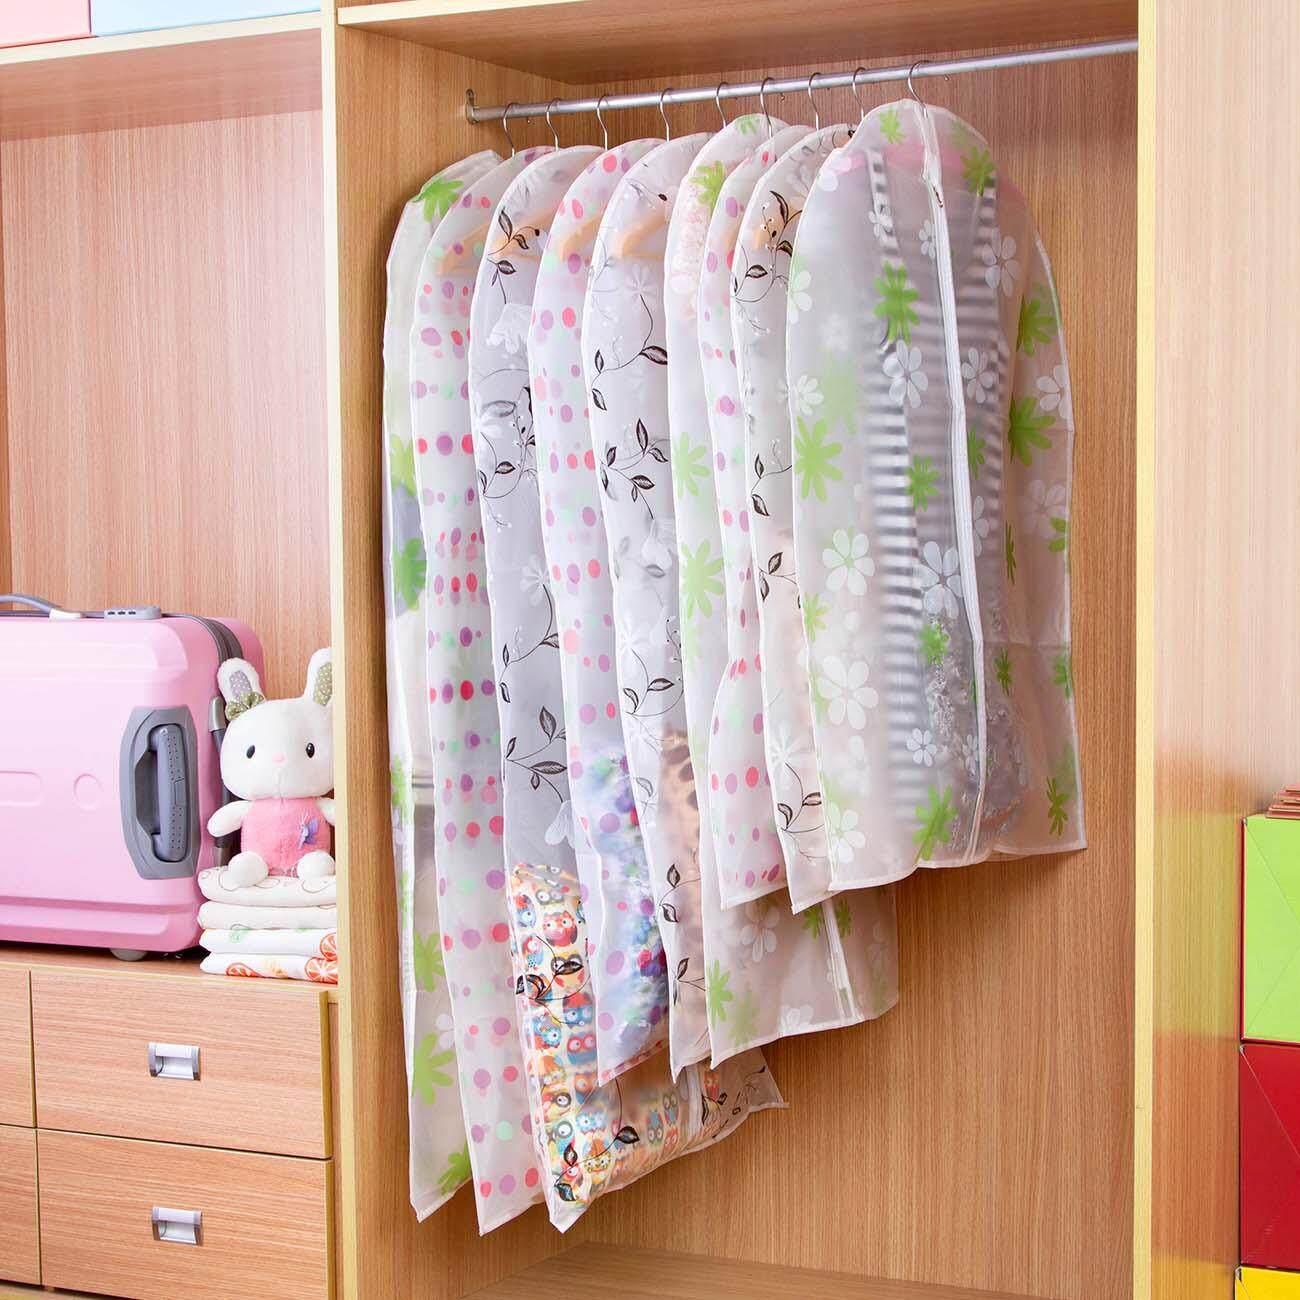 841999826c21 Homenhome Transparent Hanging Pocket Clothing Dust Cover Suit Storage Bag